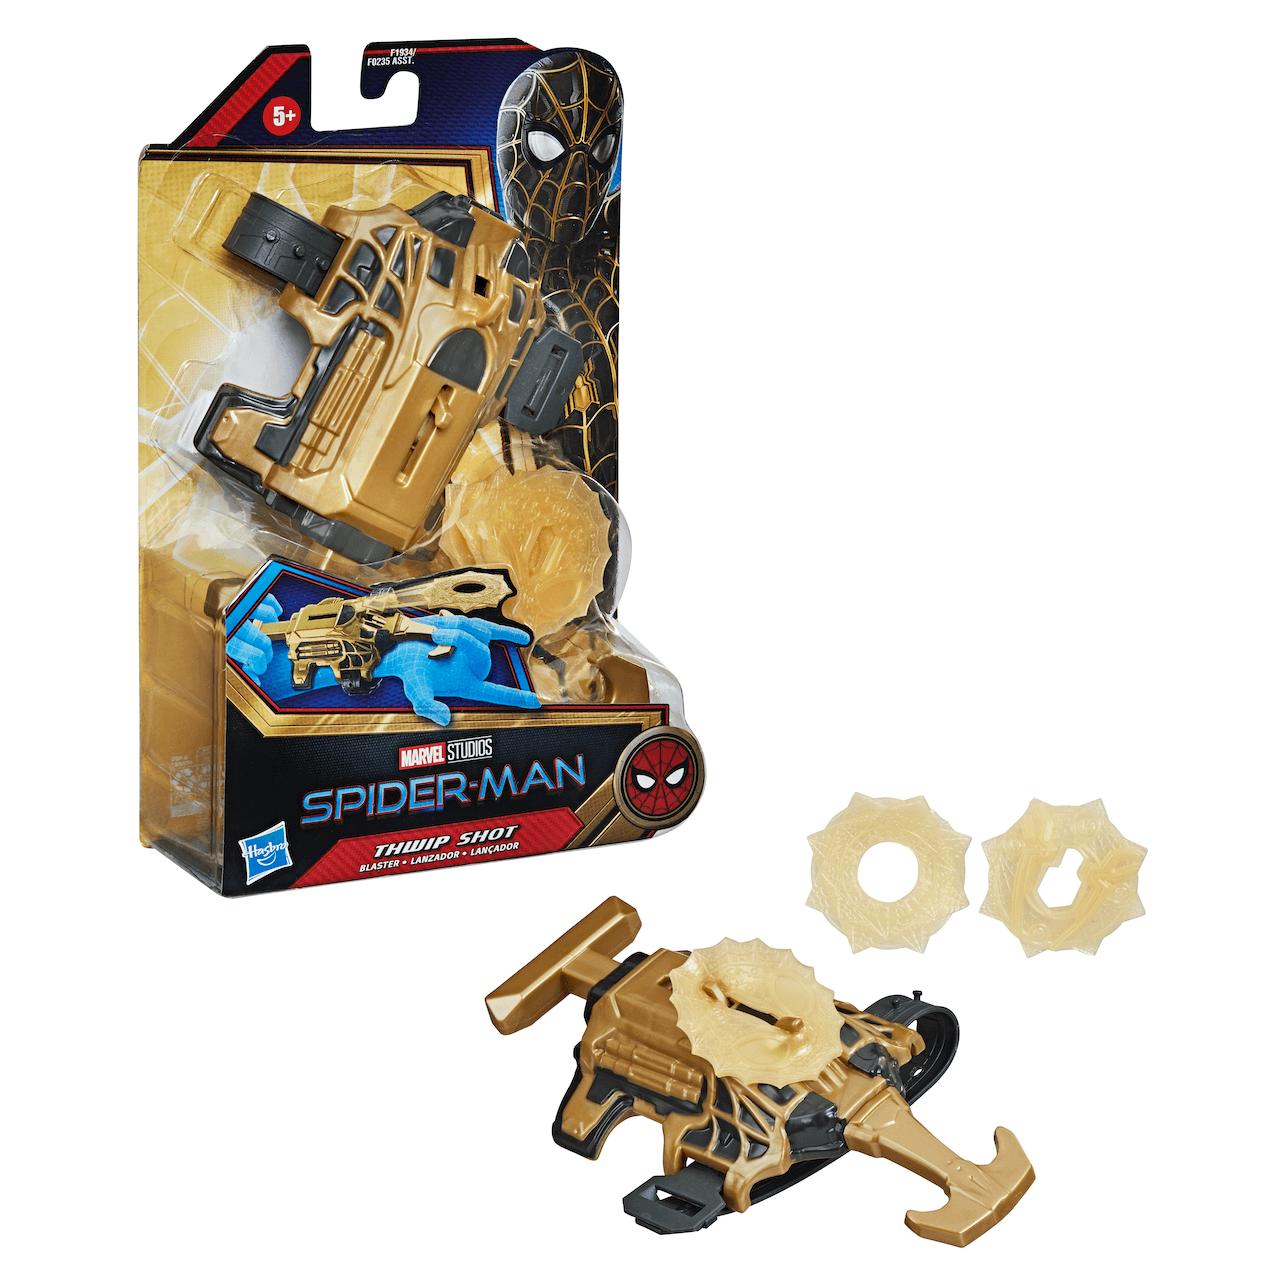 Spider-Man Hero Blaster Black and Gold